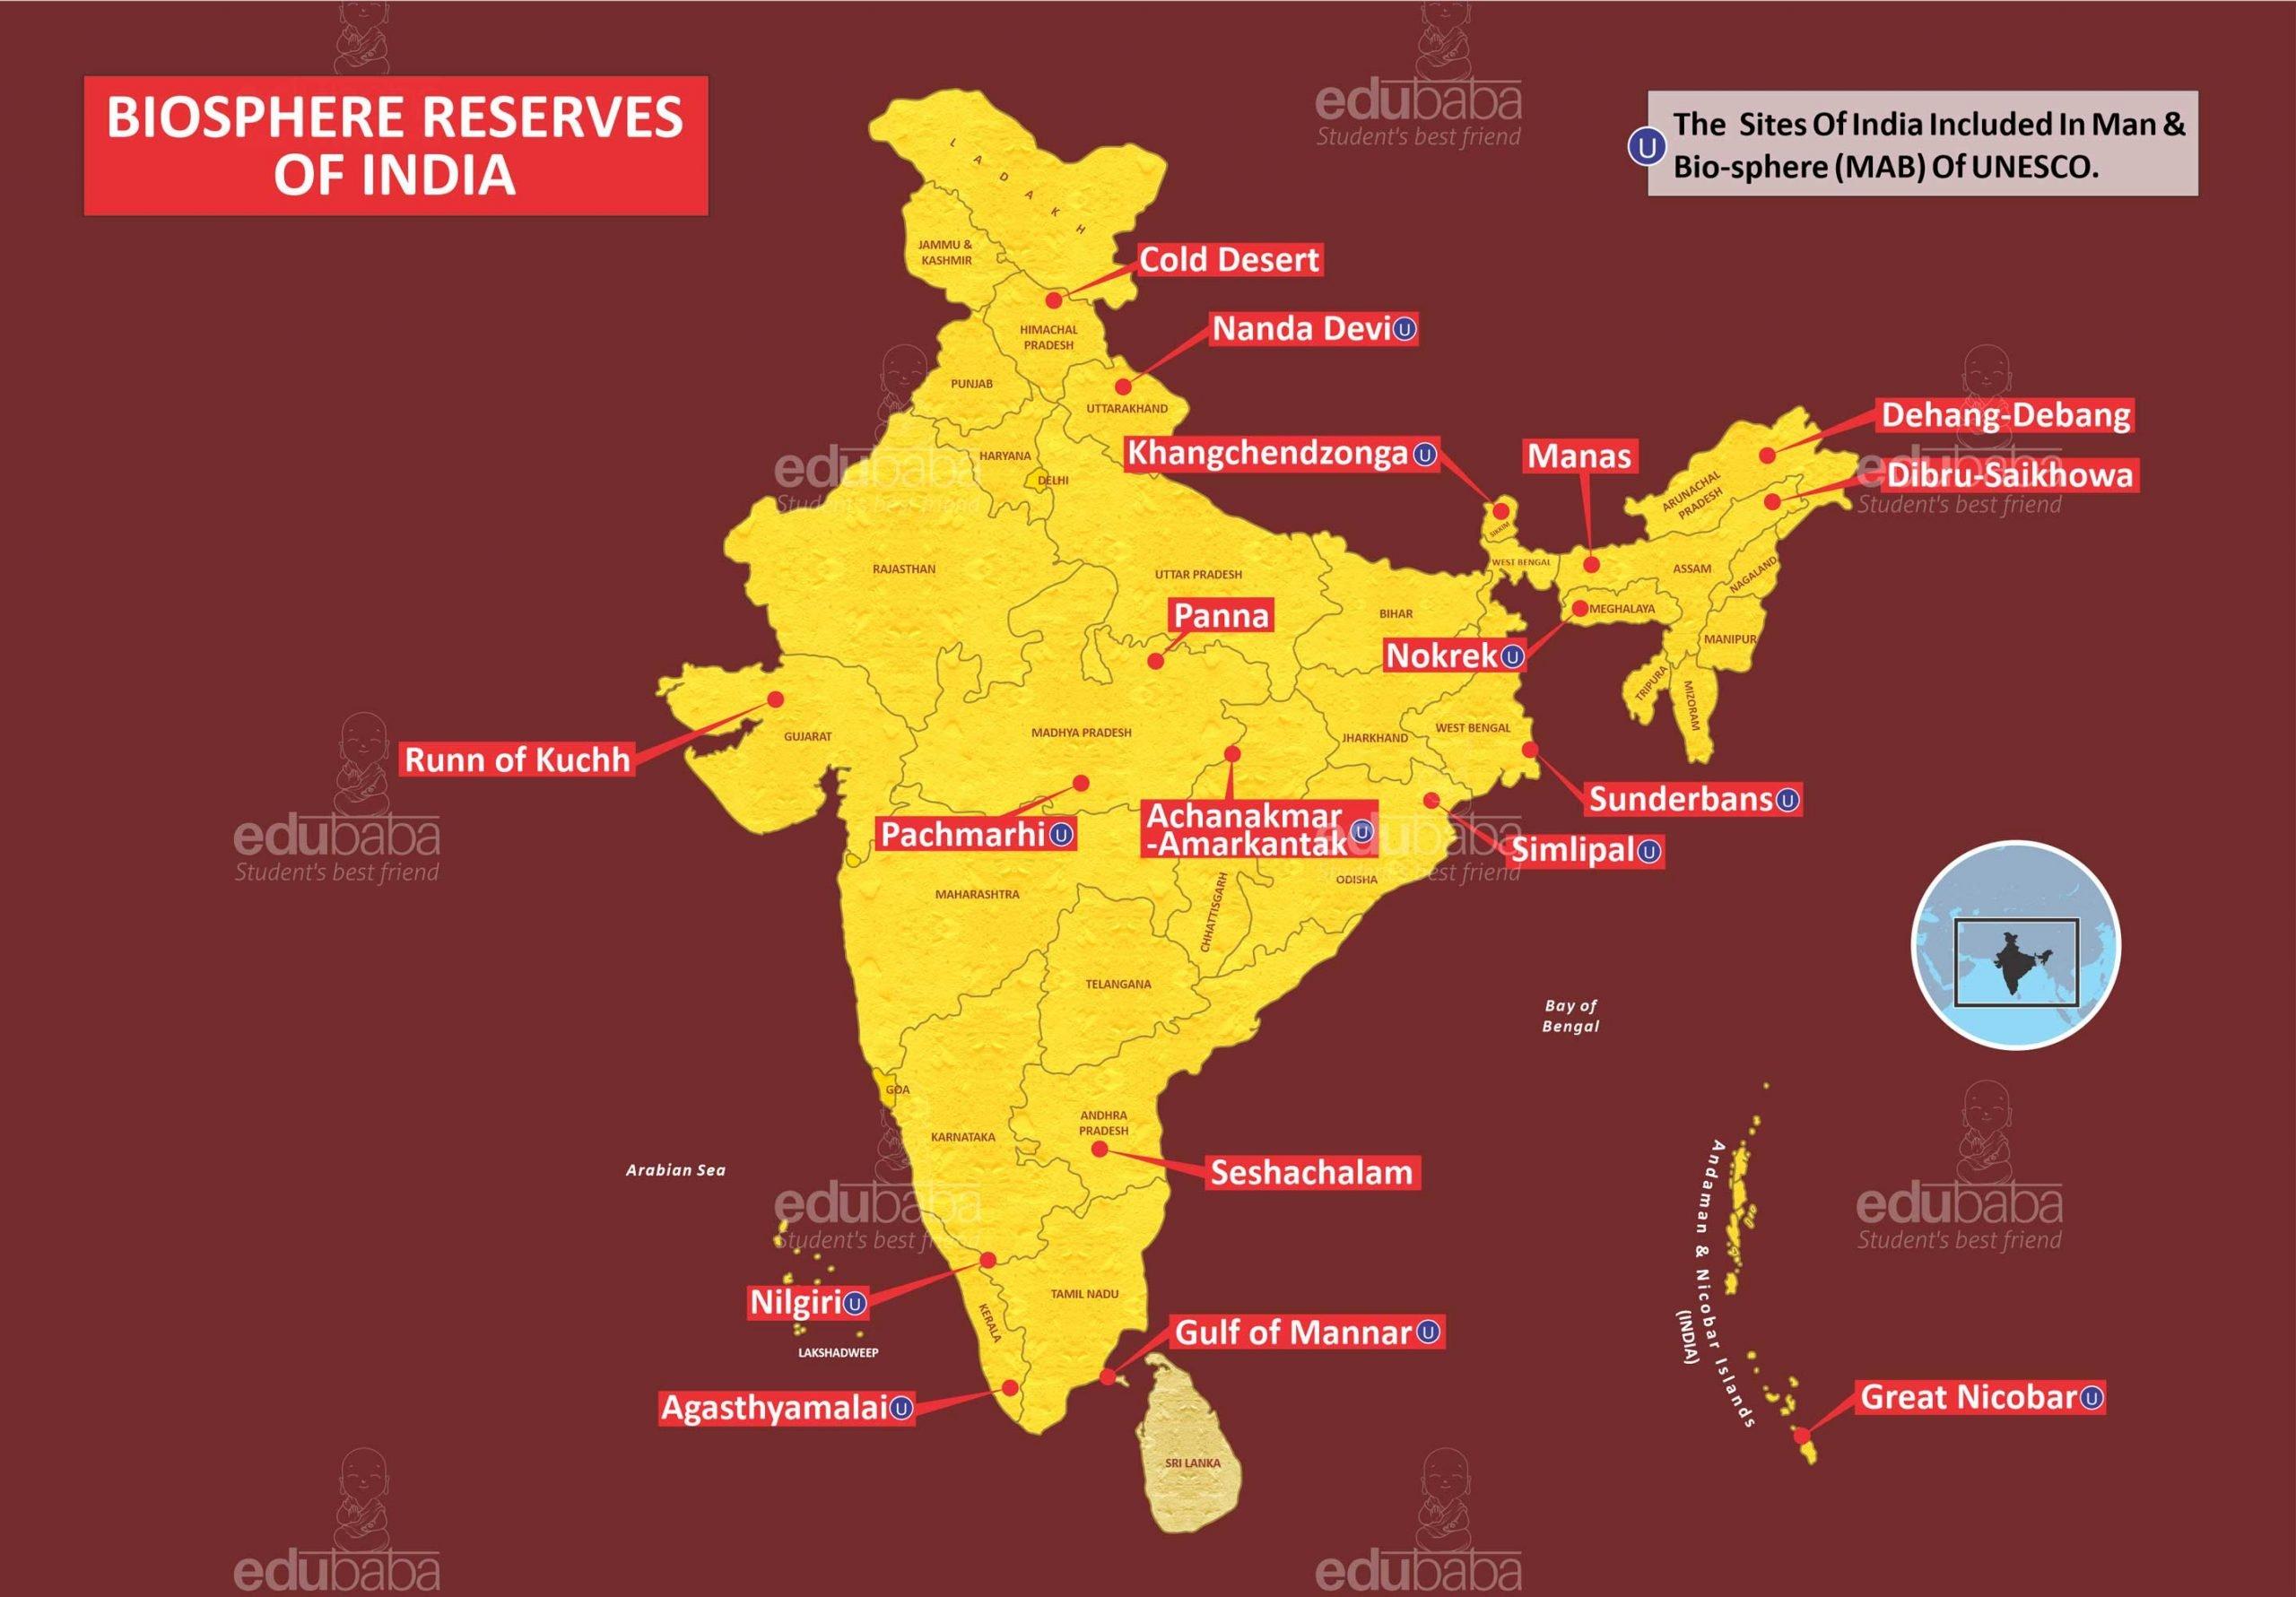 Biosphere Reserves of India